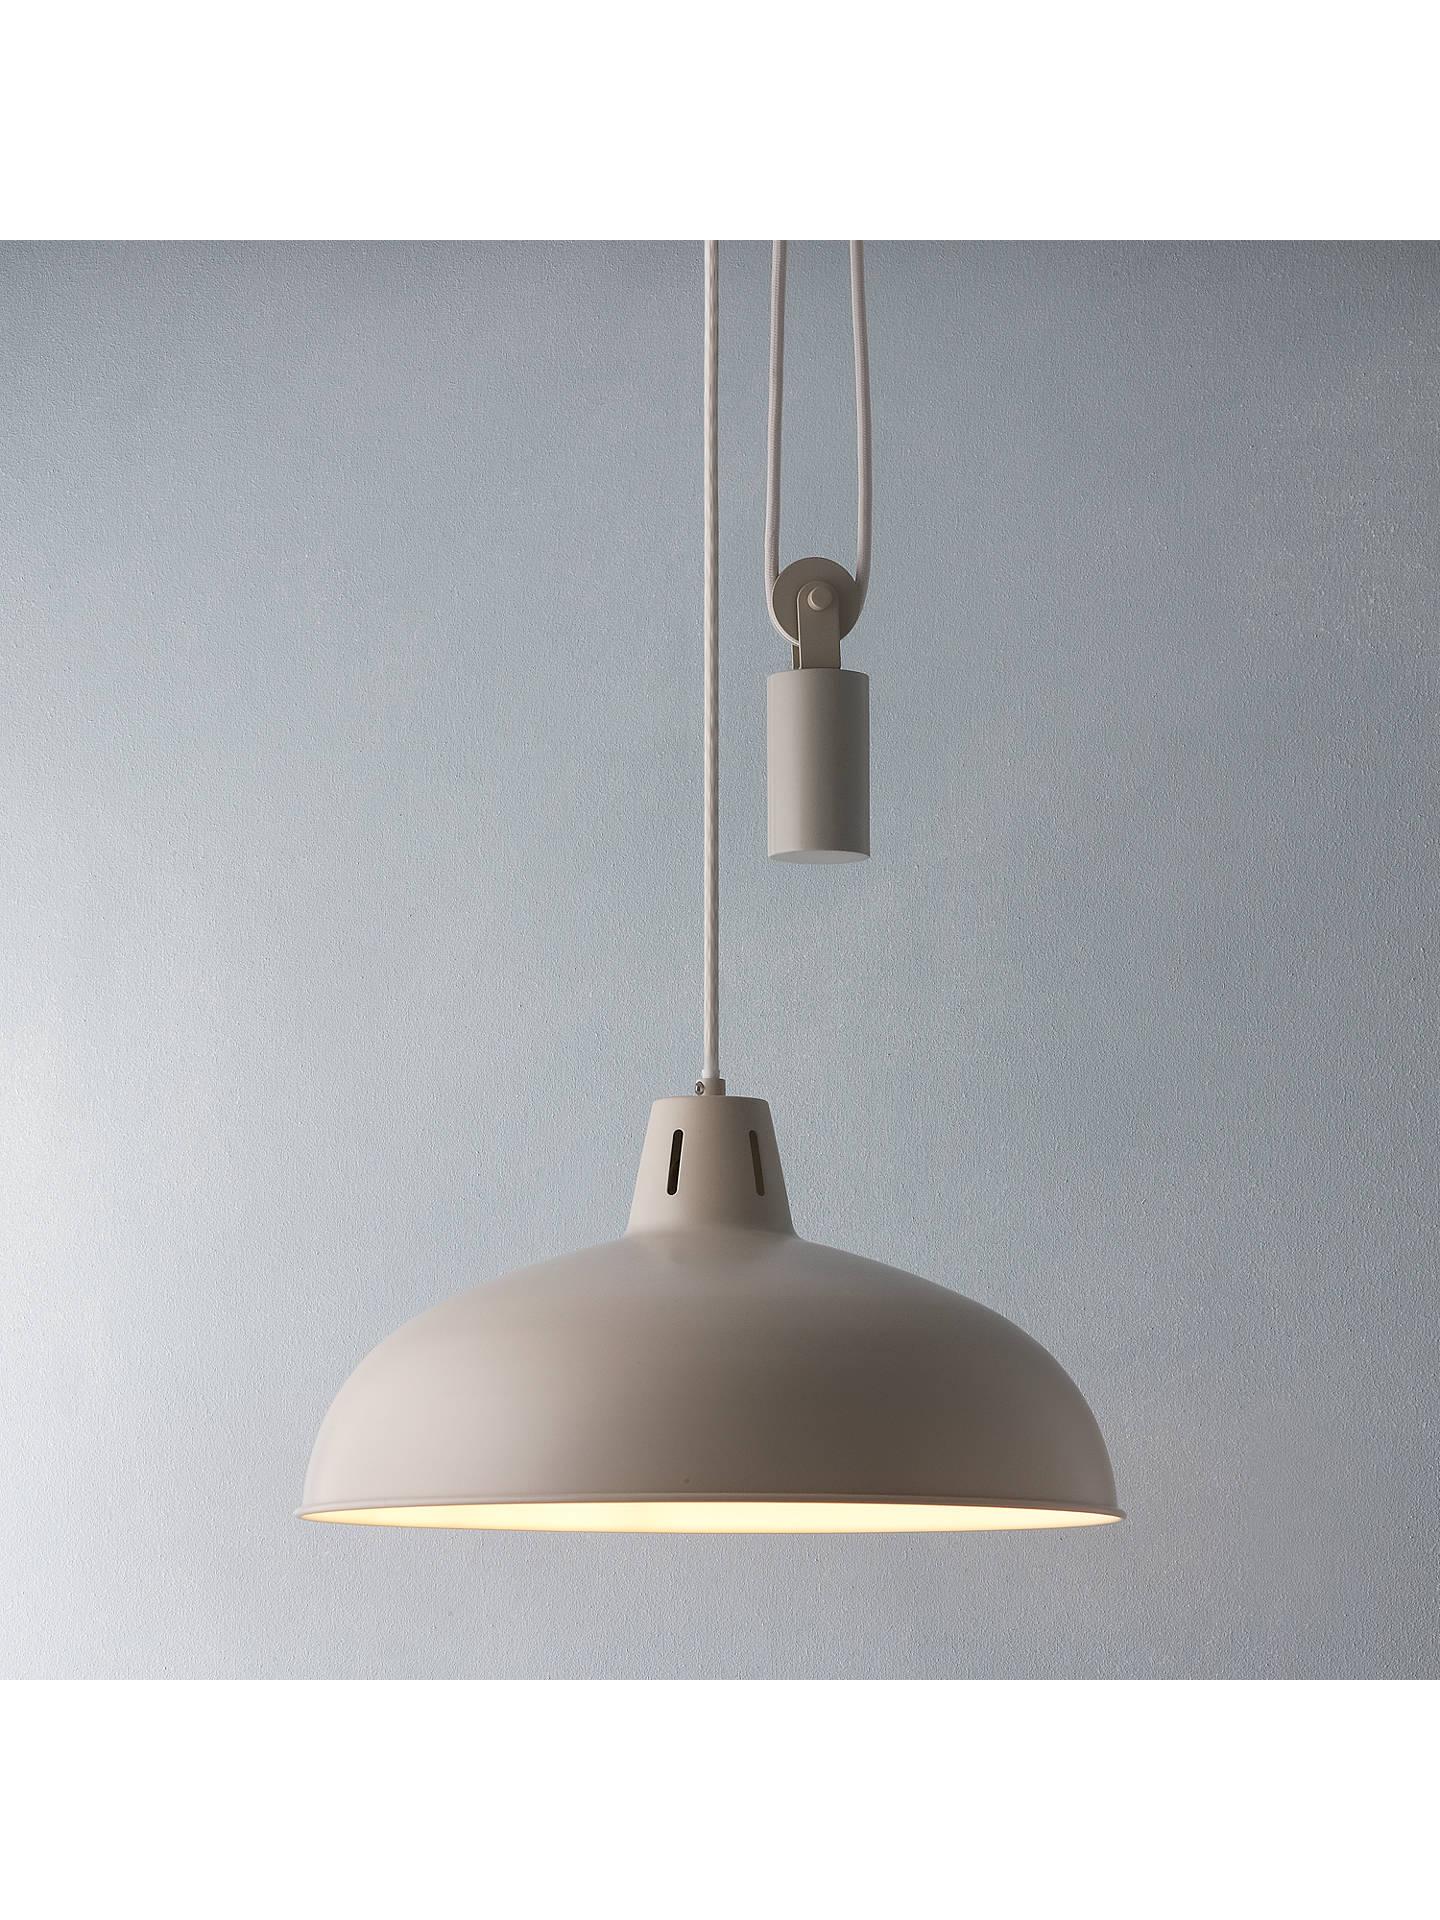 John Lewis Brigitta Ceiling Light At Partners